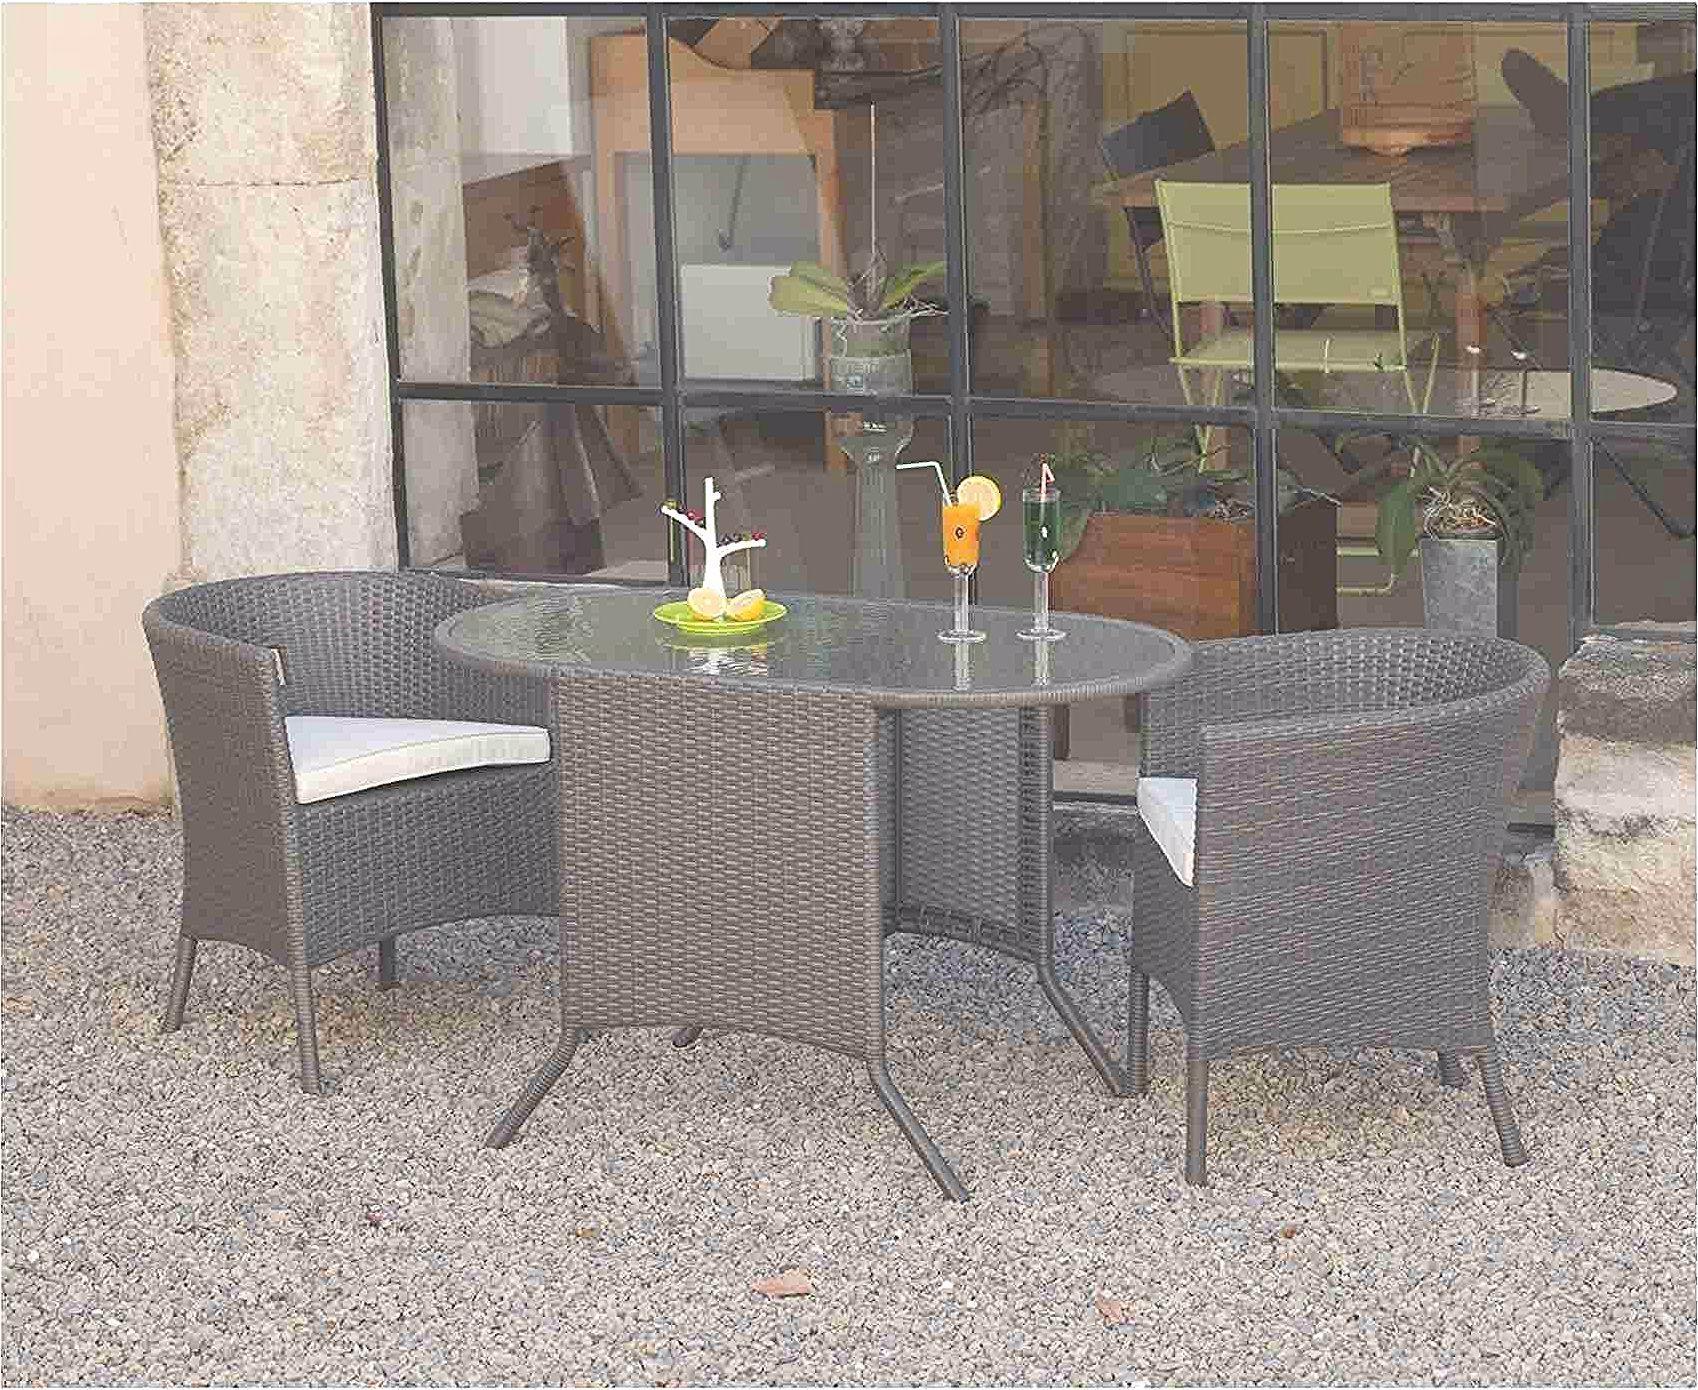 79 Glamorous Mobilier Jardin Leclerc   Outdoor Furniture ... dedans Leclerc Mobilier De Jardin